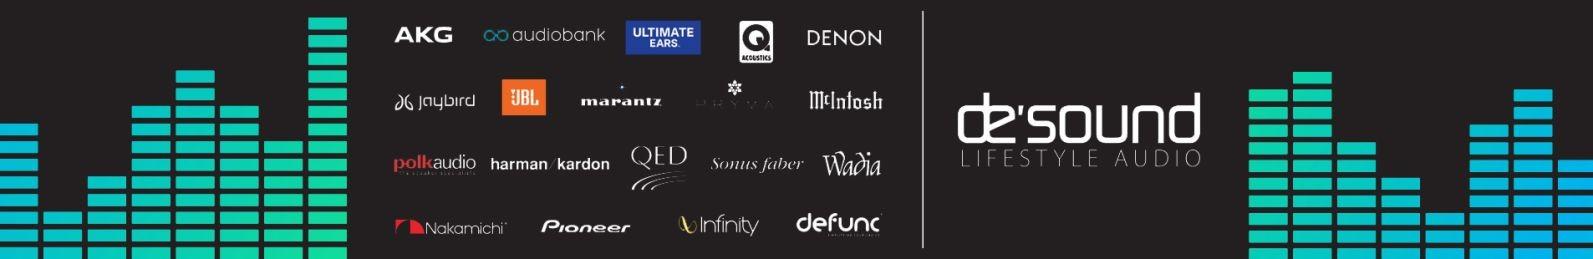 Desound Official Store